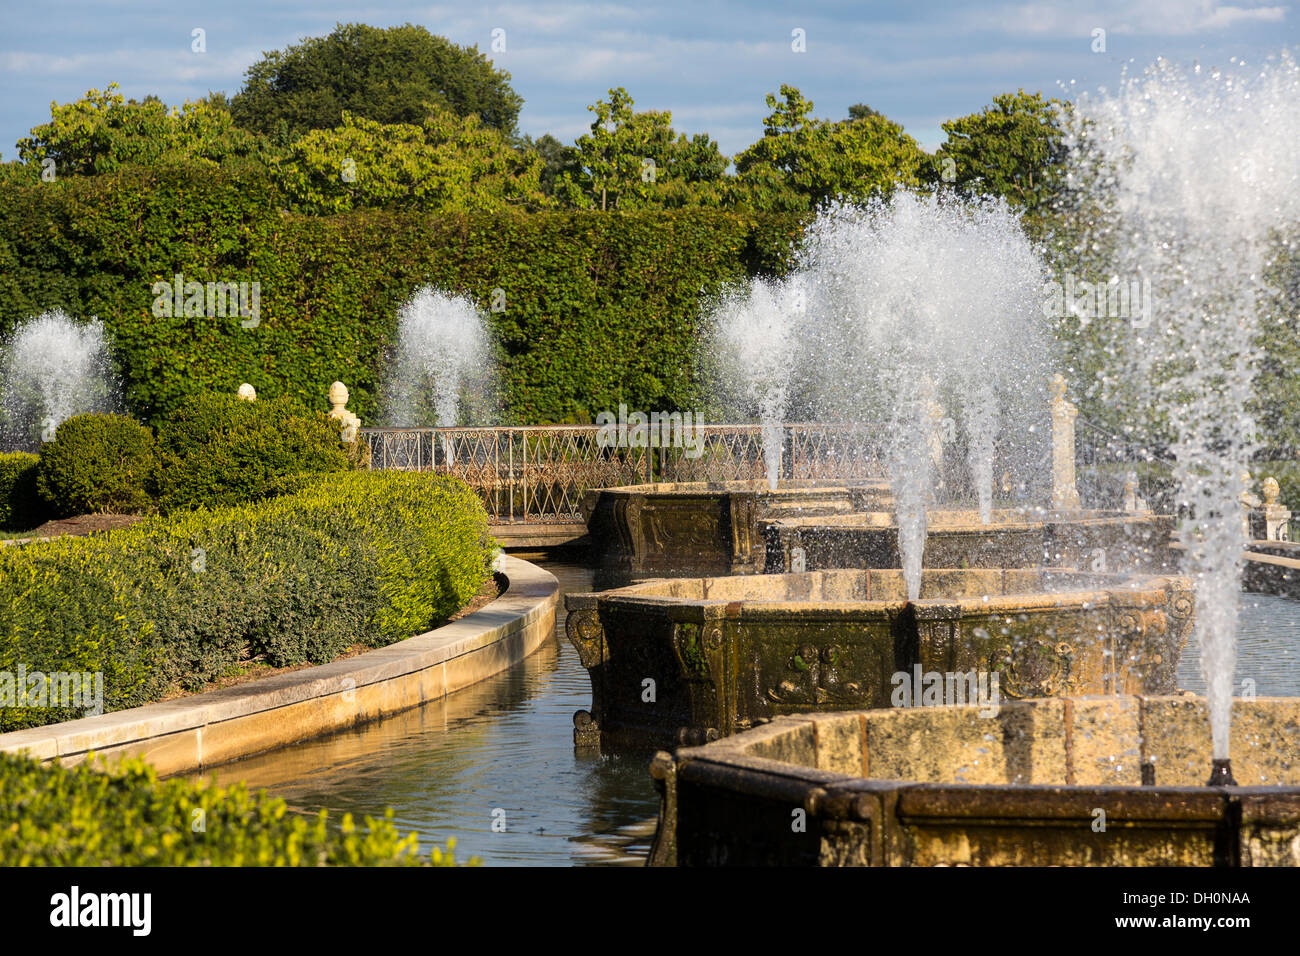 Detail Of The Main Fountain Garden, Longwood Gardens, Kennett Square,  Pennsylvania, USA